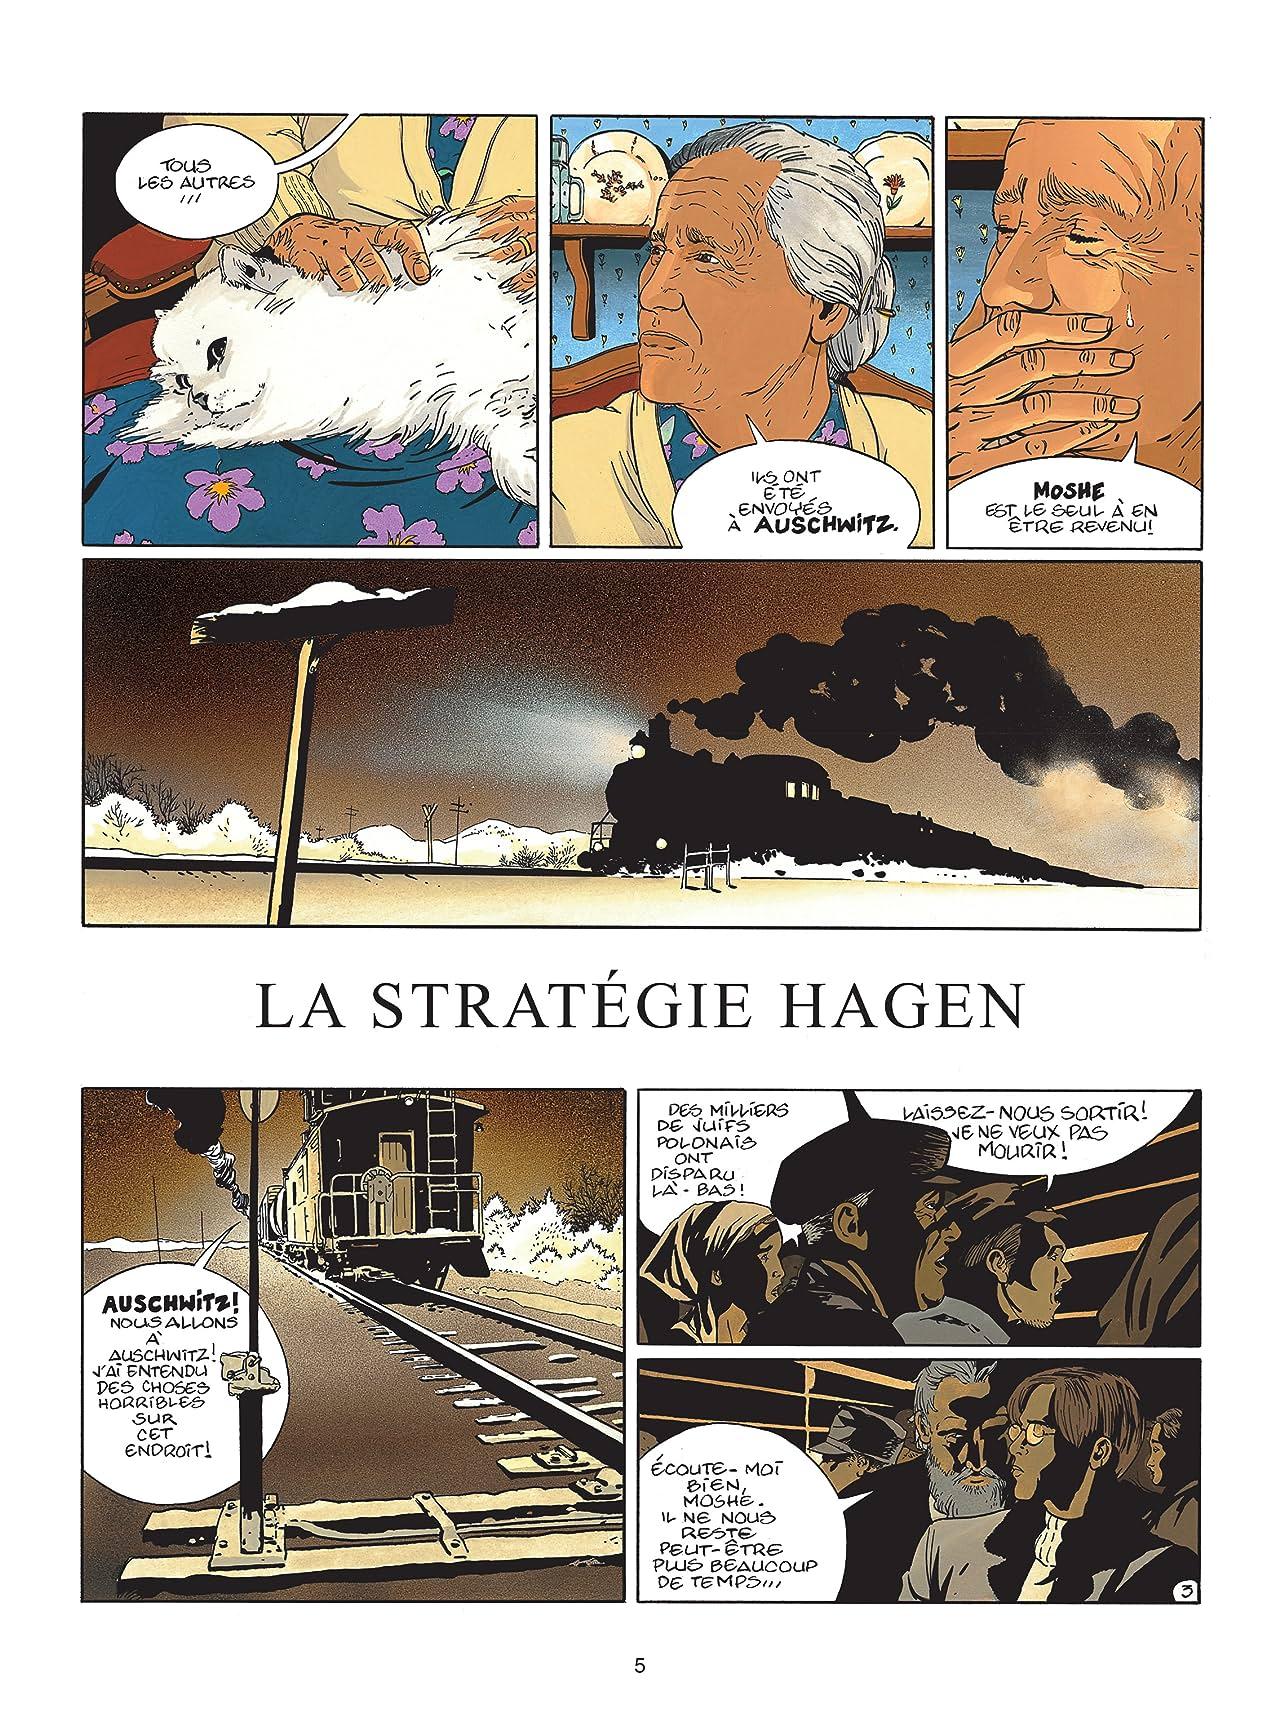 I.R.$. Tome 2: Stratégie Hagen (La)